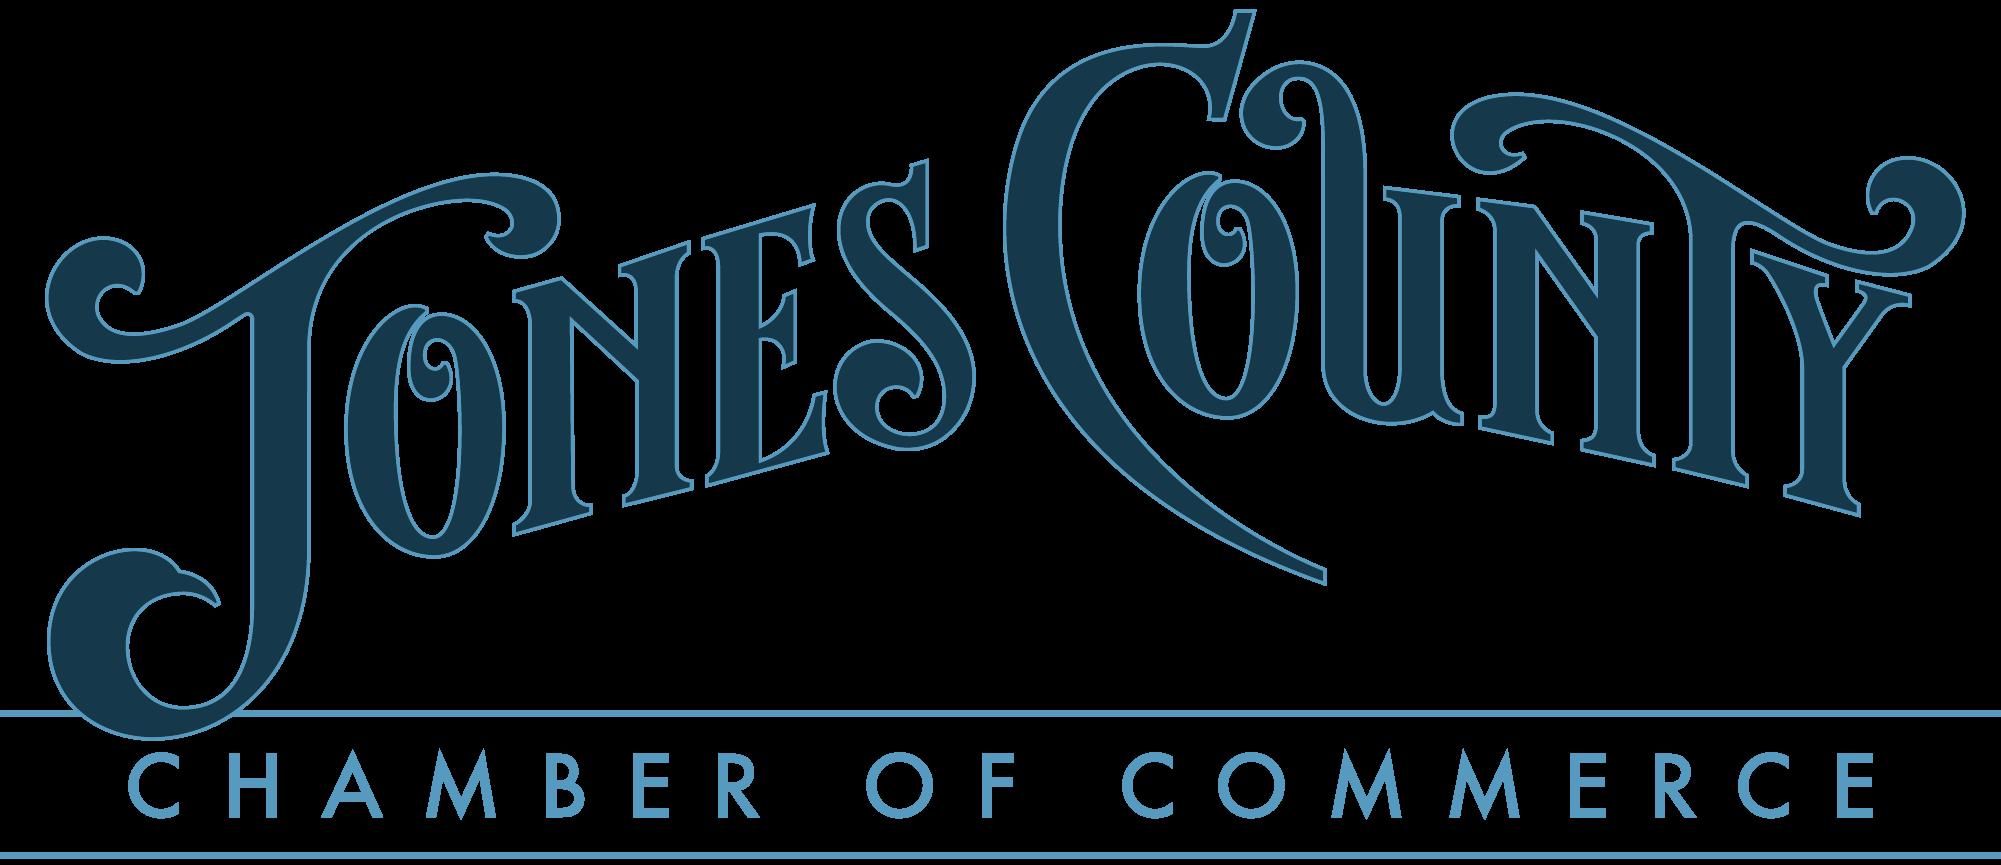 Jones County Chamber of Commerce